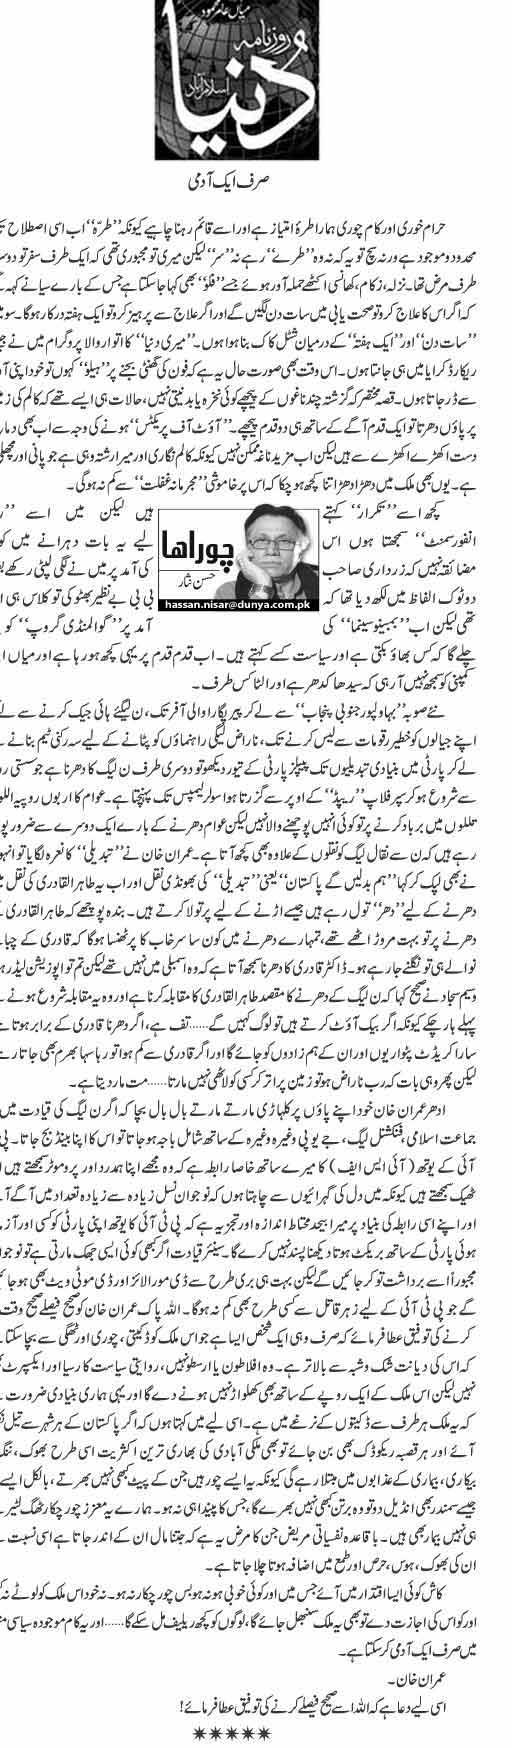 Sirf aik admi - Hassan Nisar